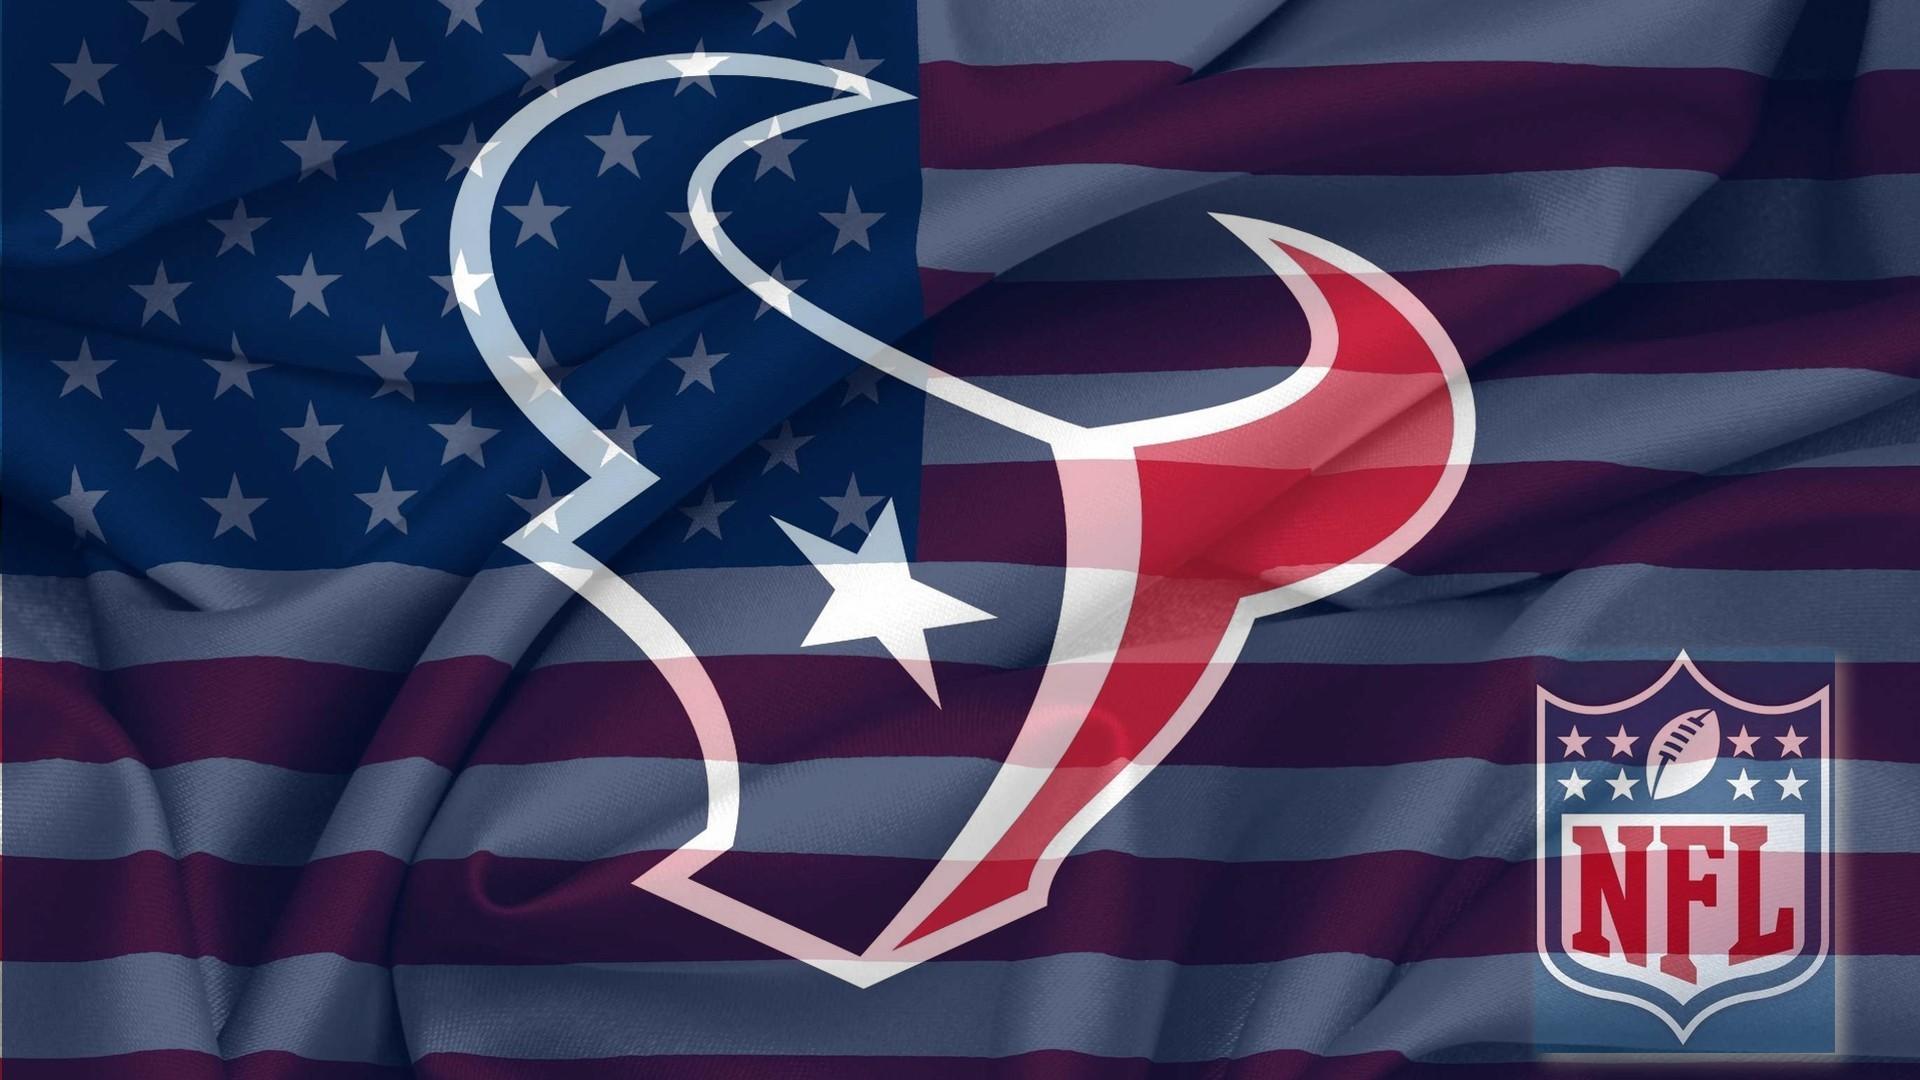 NFL Houston Texans Logo With NFL Logo On USA American Flag Background .